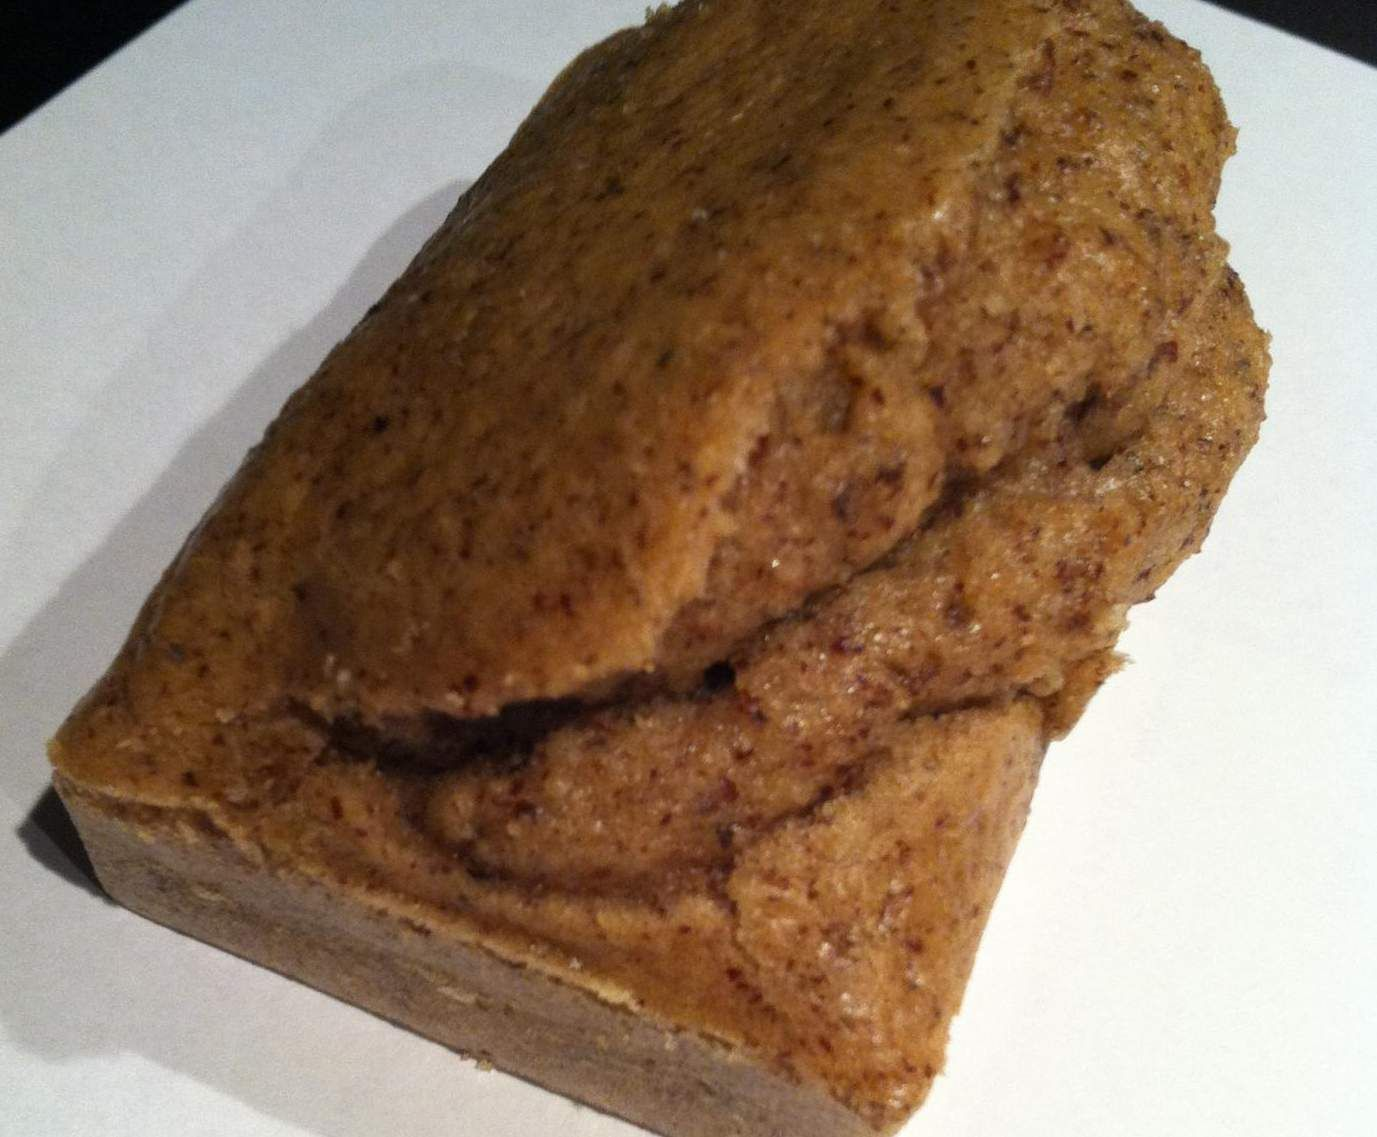 Keto Cake Recipe Thermomix: Rezept Eiweissbrot Gelingsicher Low Carb Von 2bubenmama